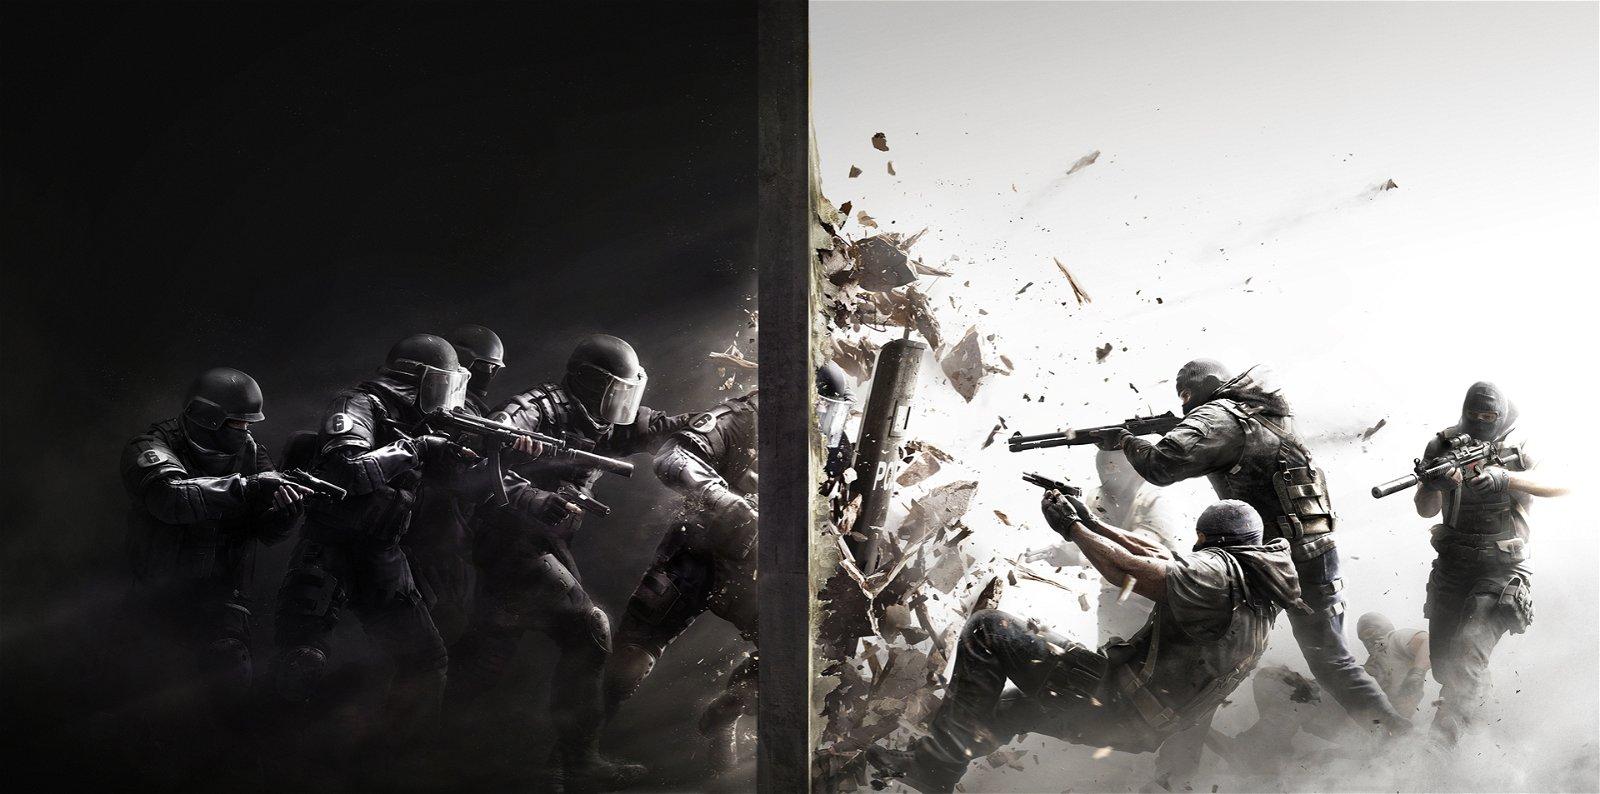 Rainbow Six Siege to Have New Take on DLC